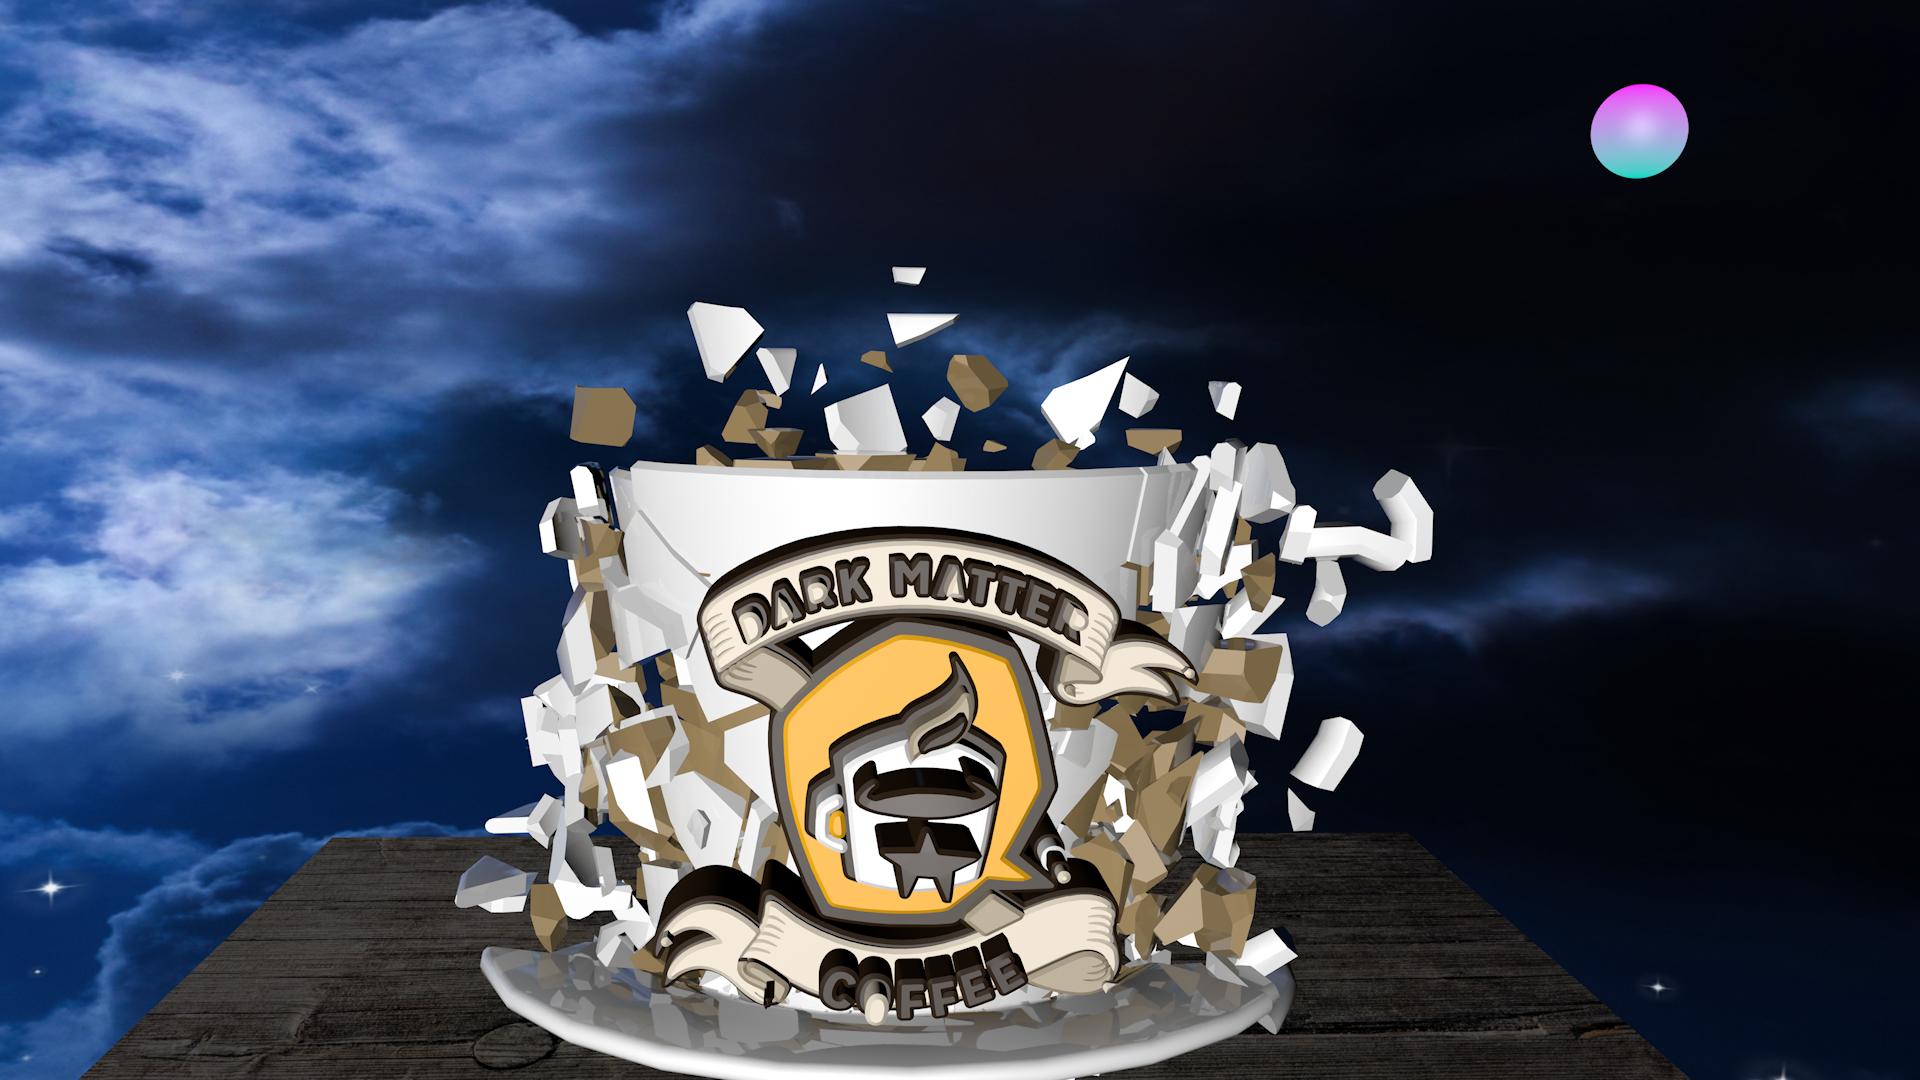 Dark Matter Logo Smashes Coffee Cup